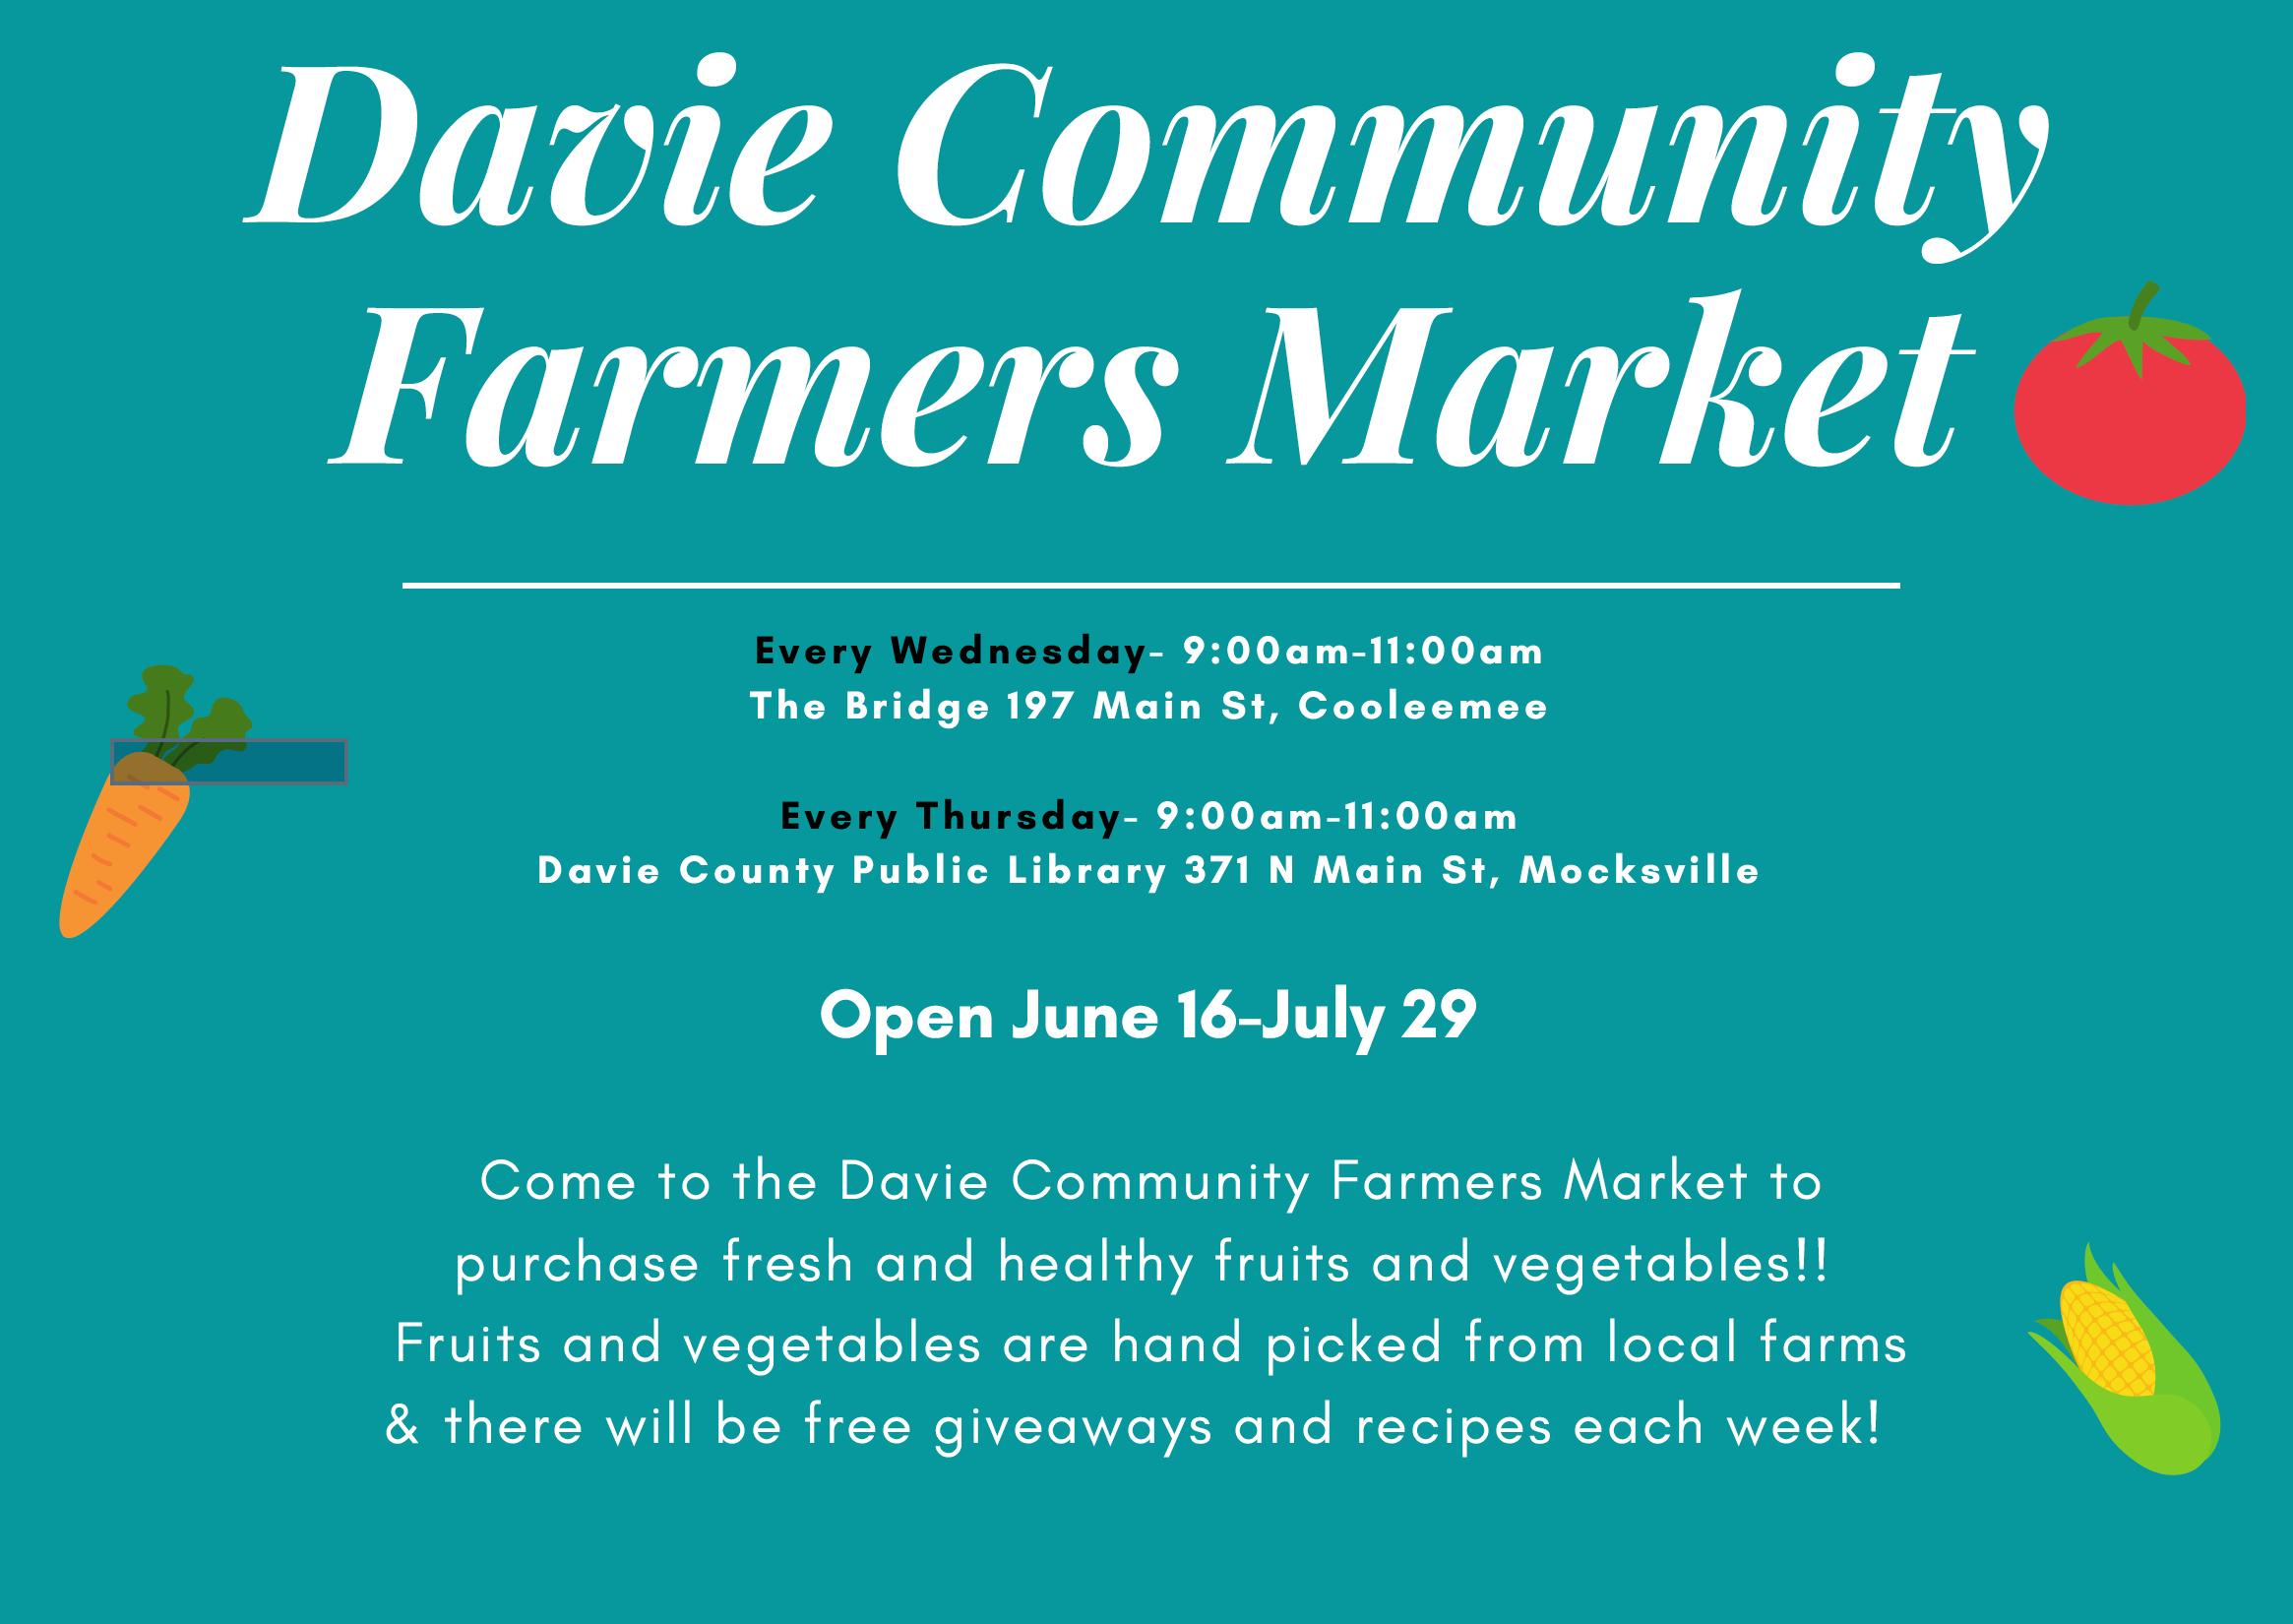 Farmers Market banner image